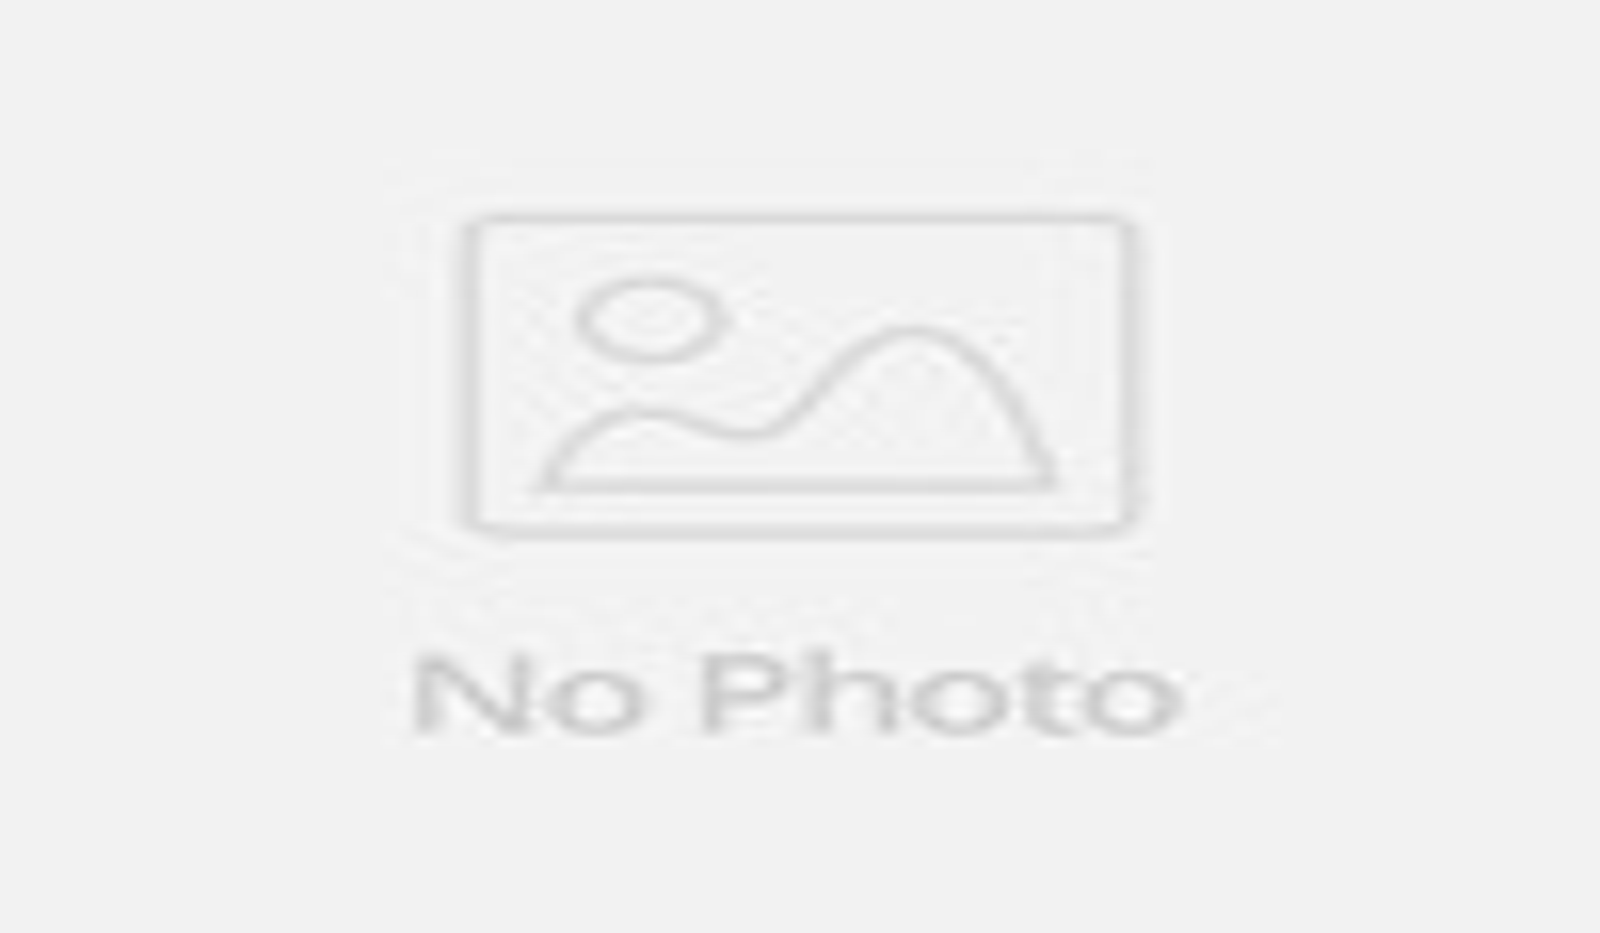 Women's Long Skirt With Hand Design